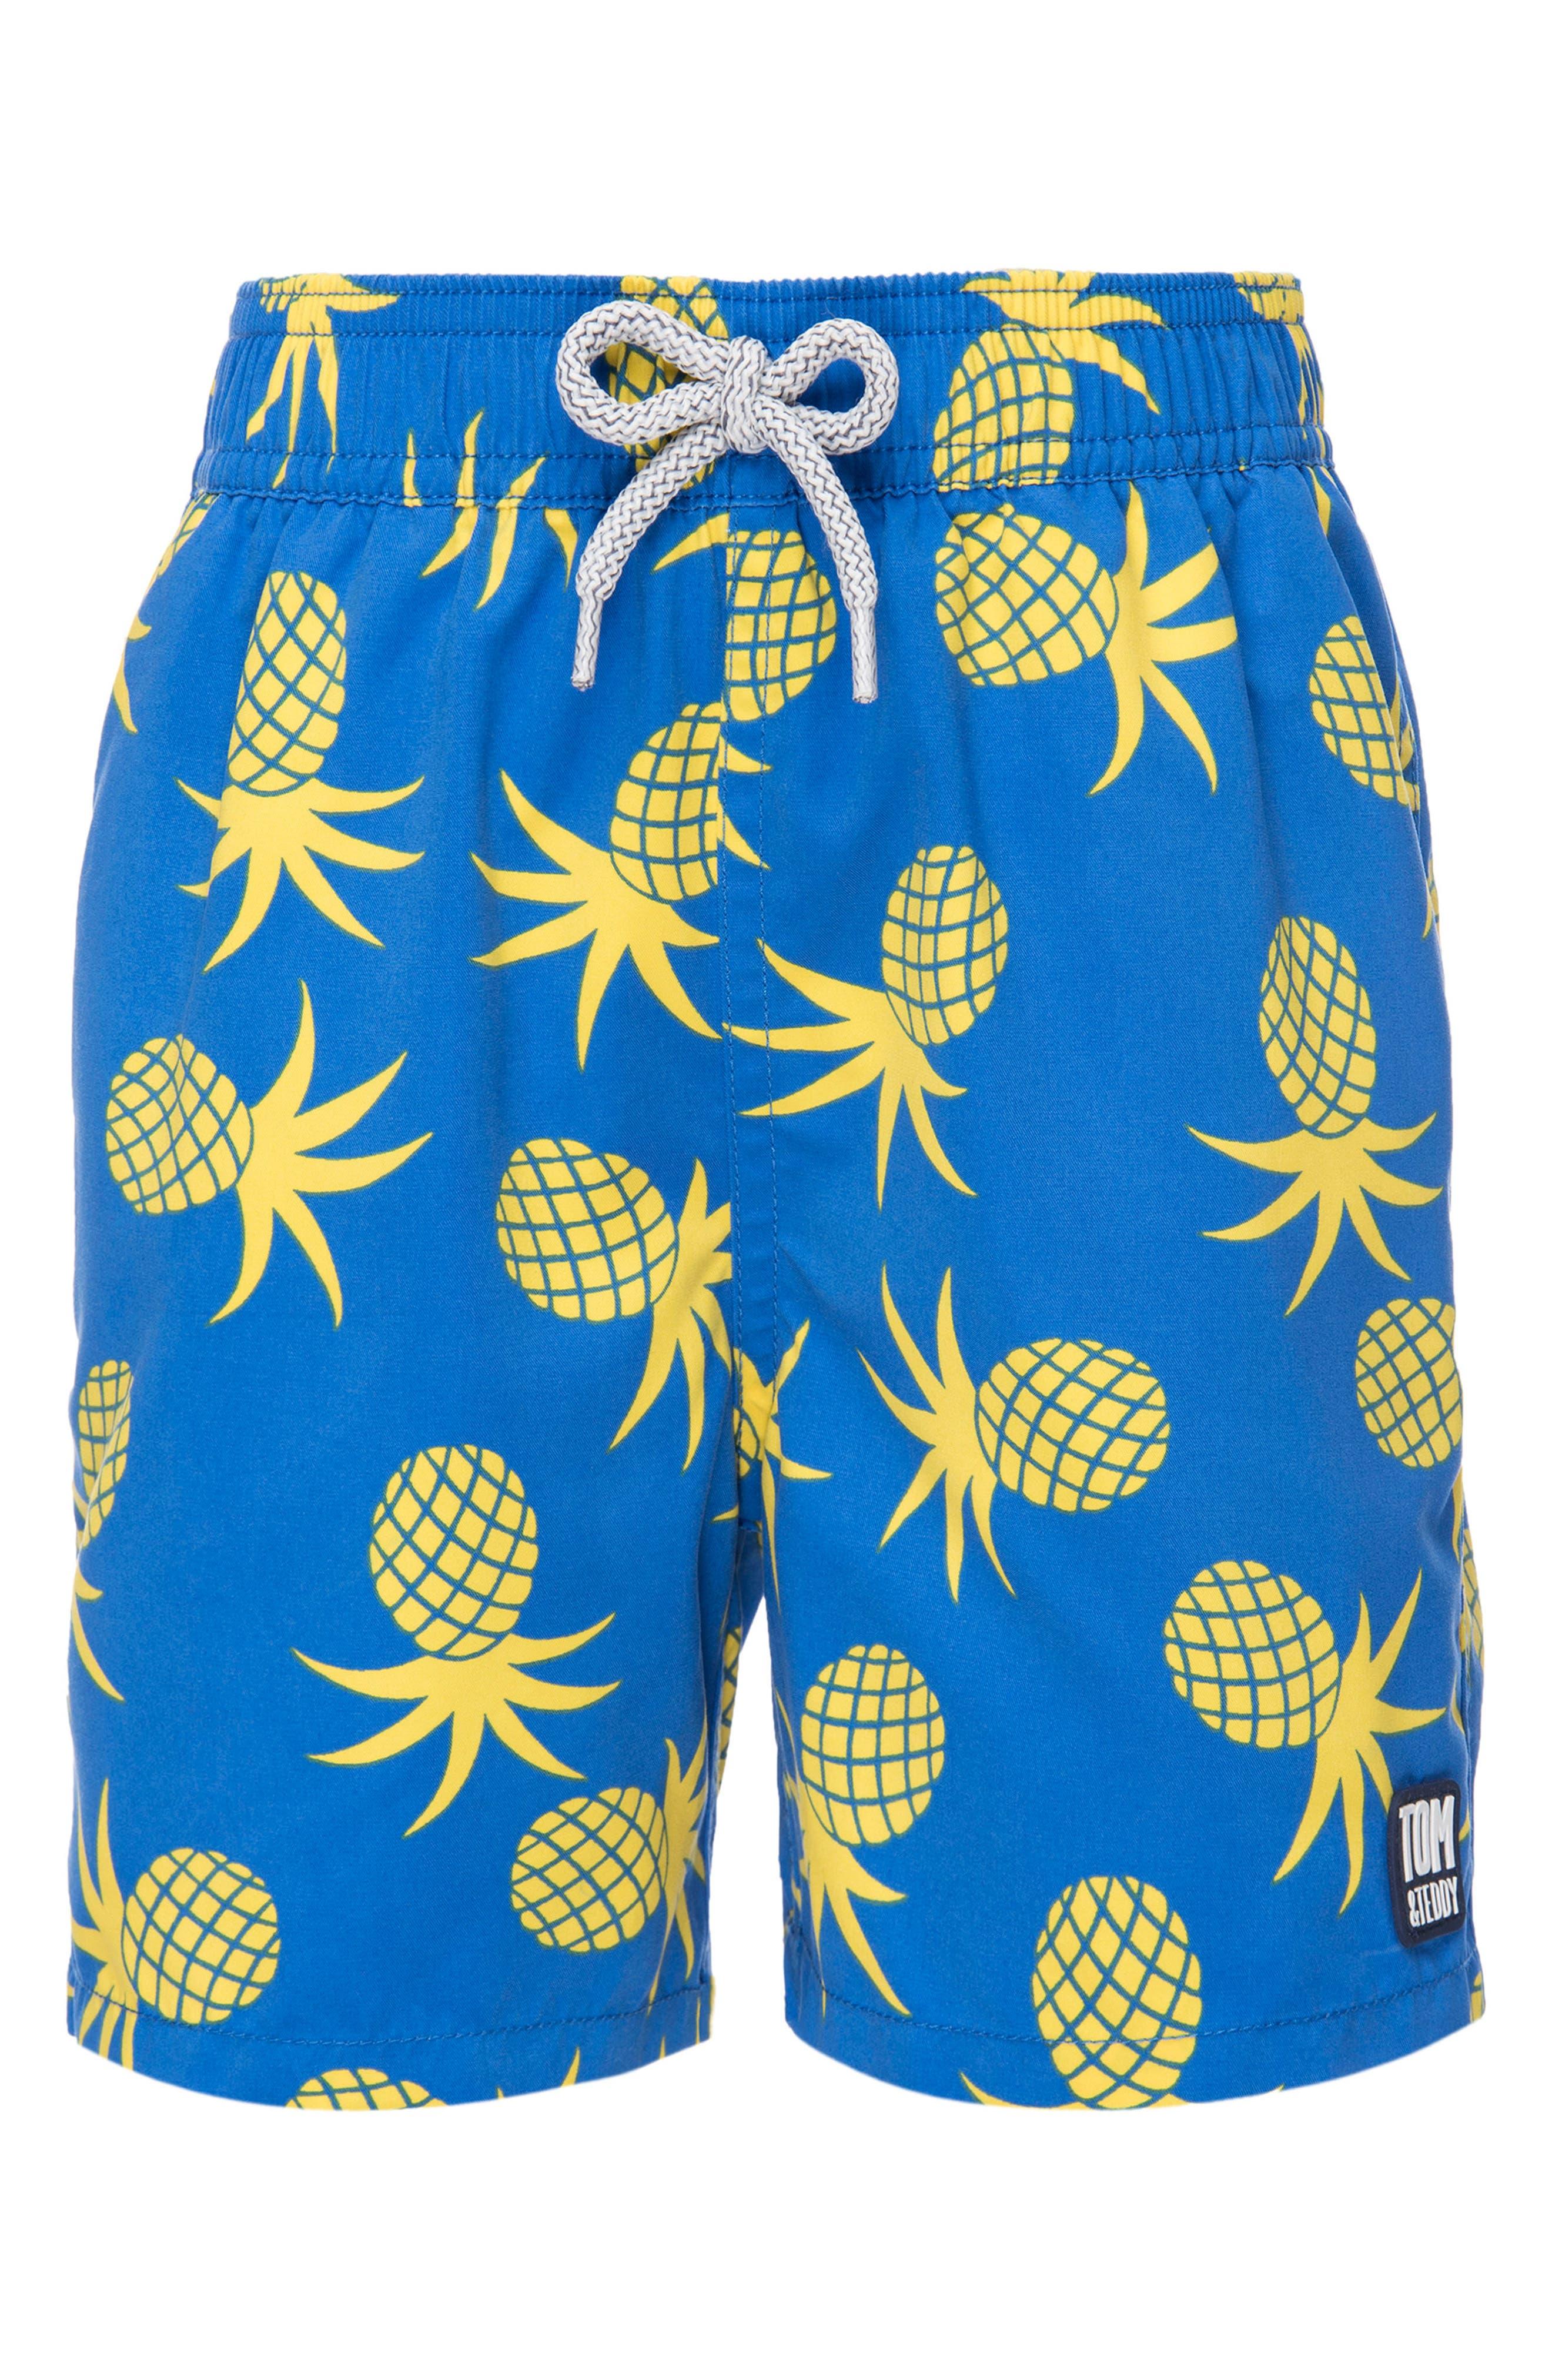 Main Image - Tom & Teddy Pineapple Swim Trunks (Toddler Boys, Little Boys & Big Boys)